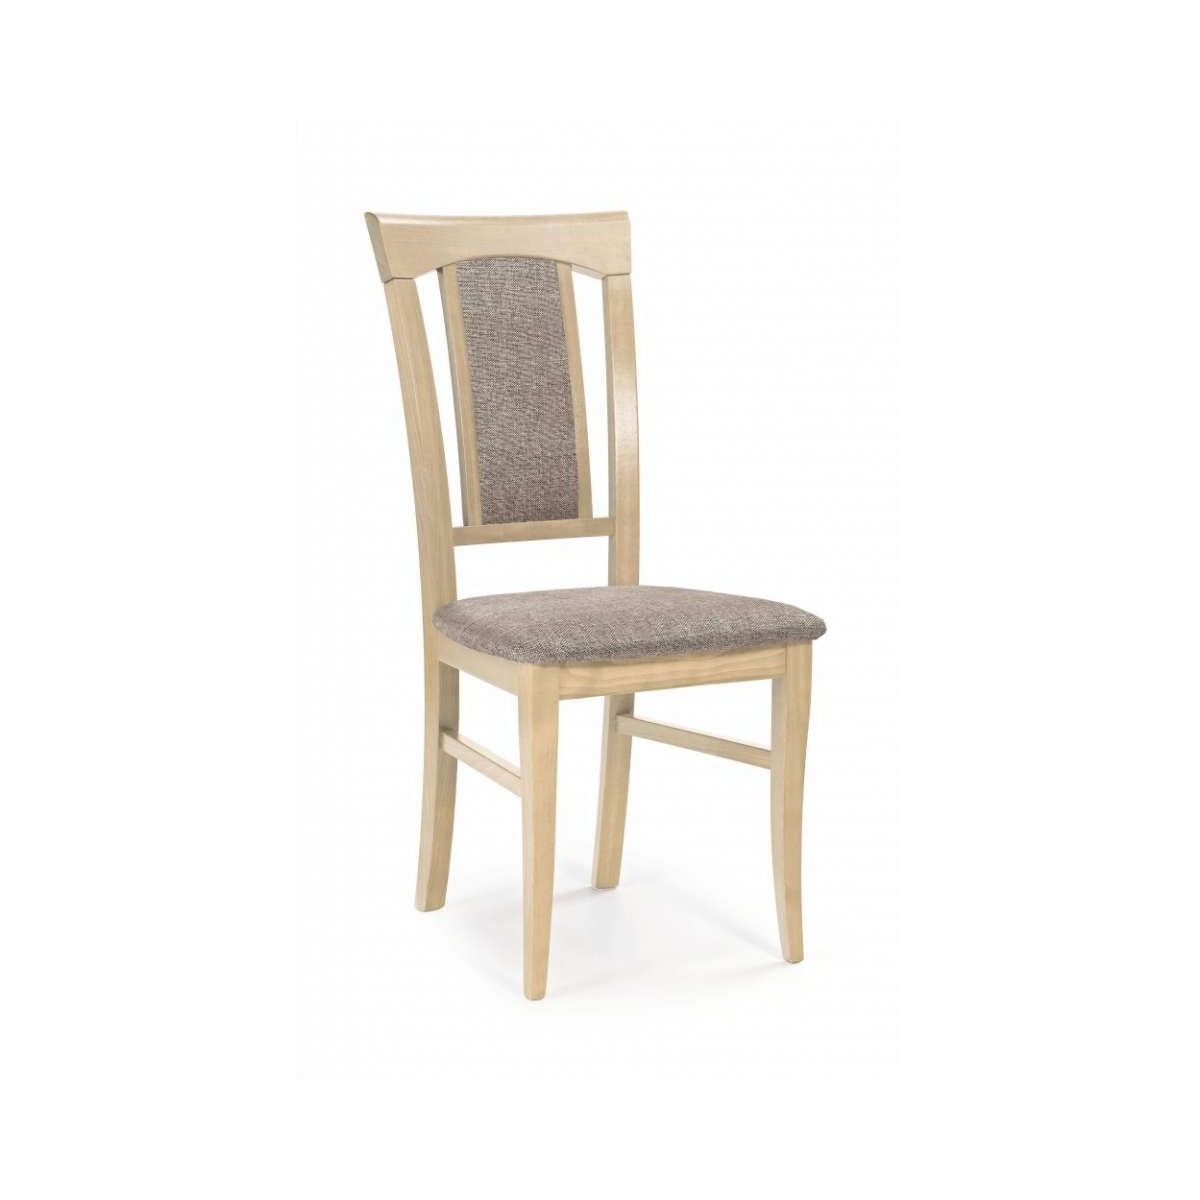 Konrad krzesło dąb sonoma inari 23 Halmar